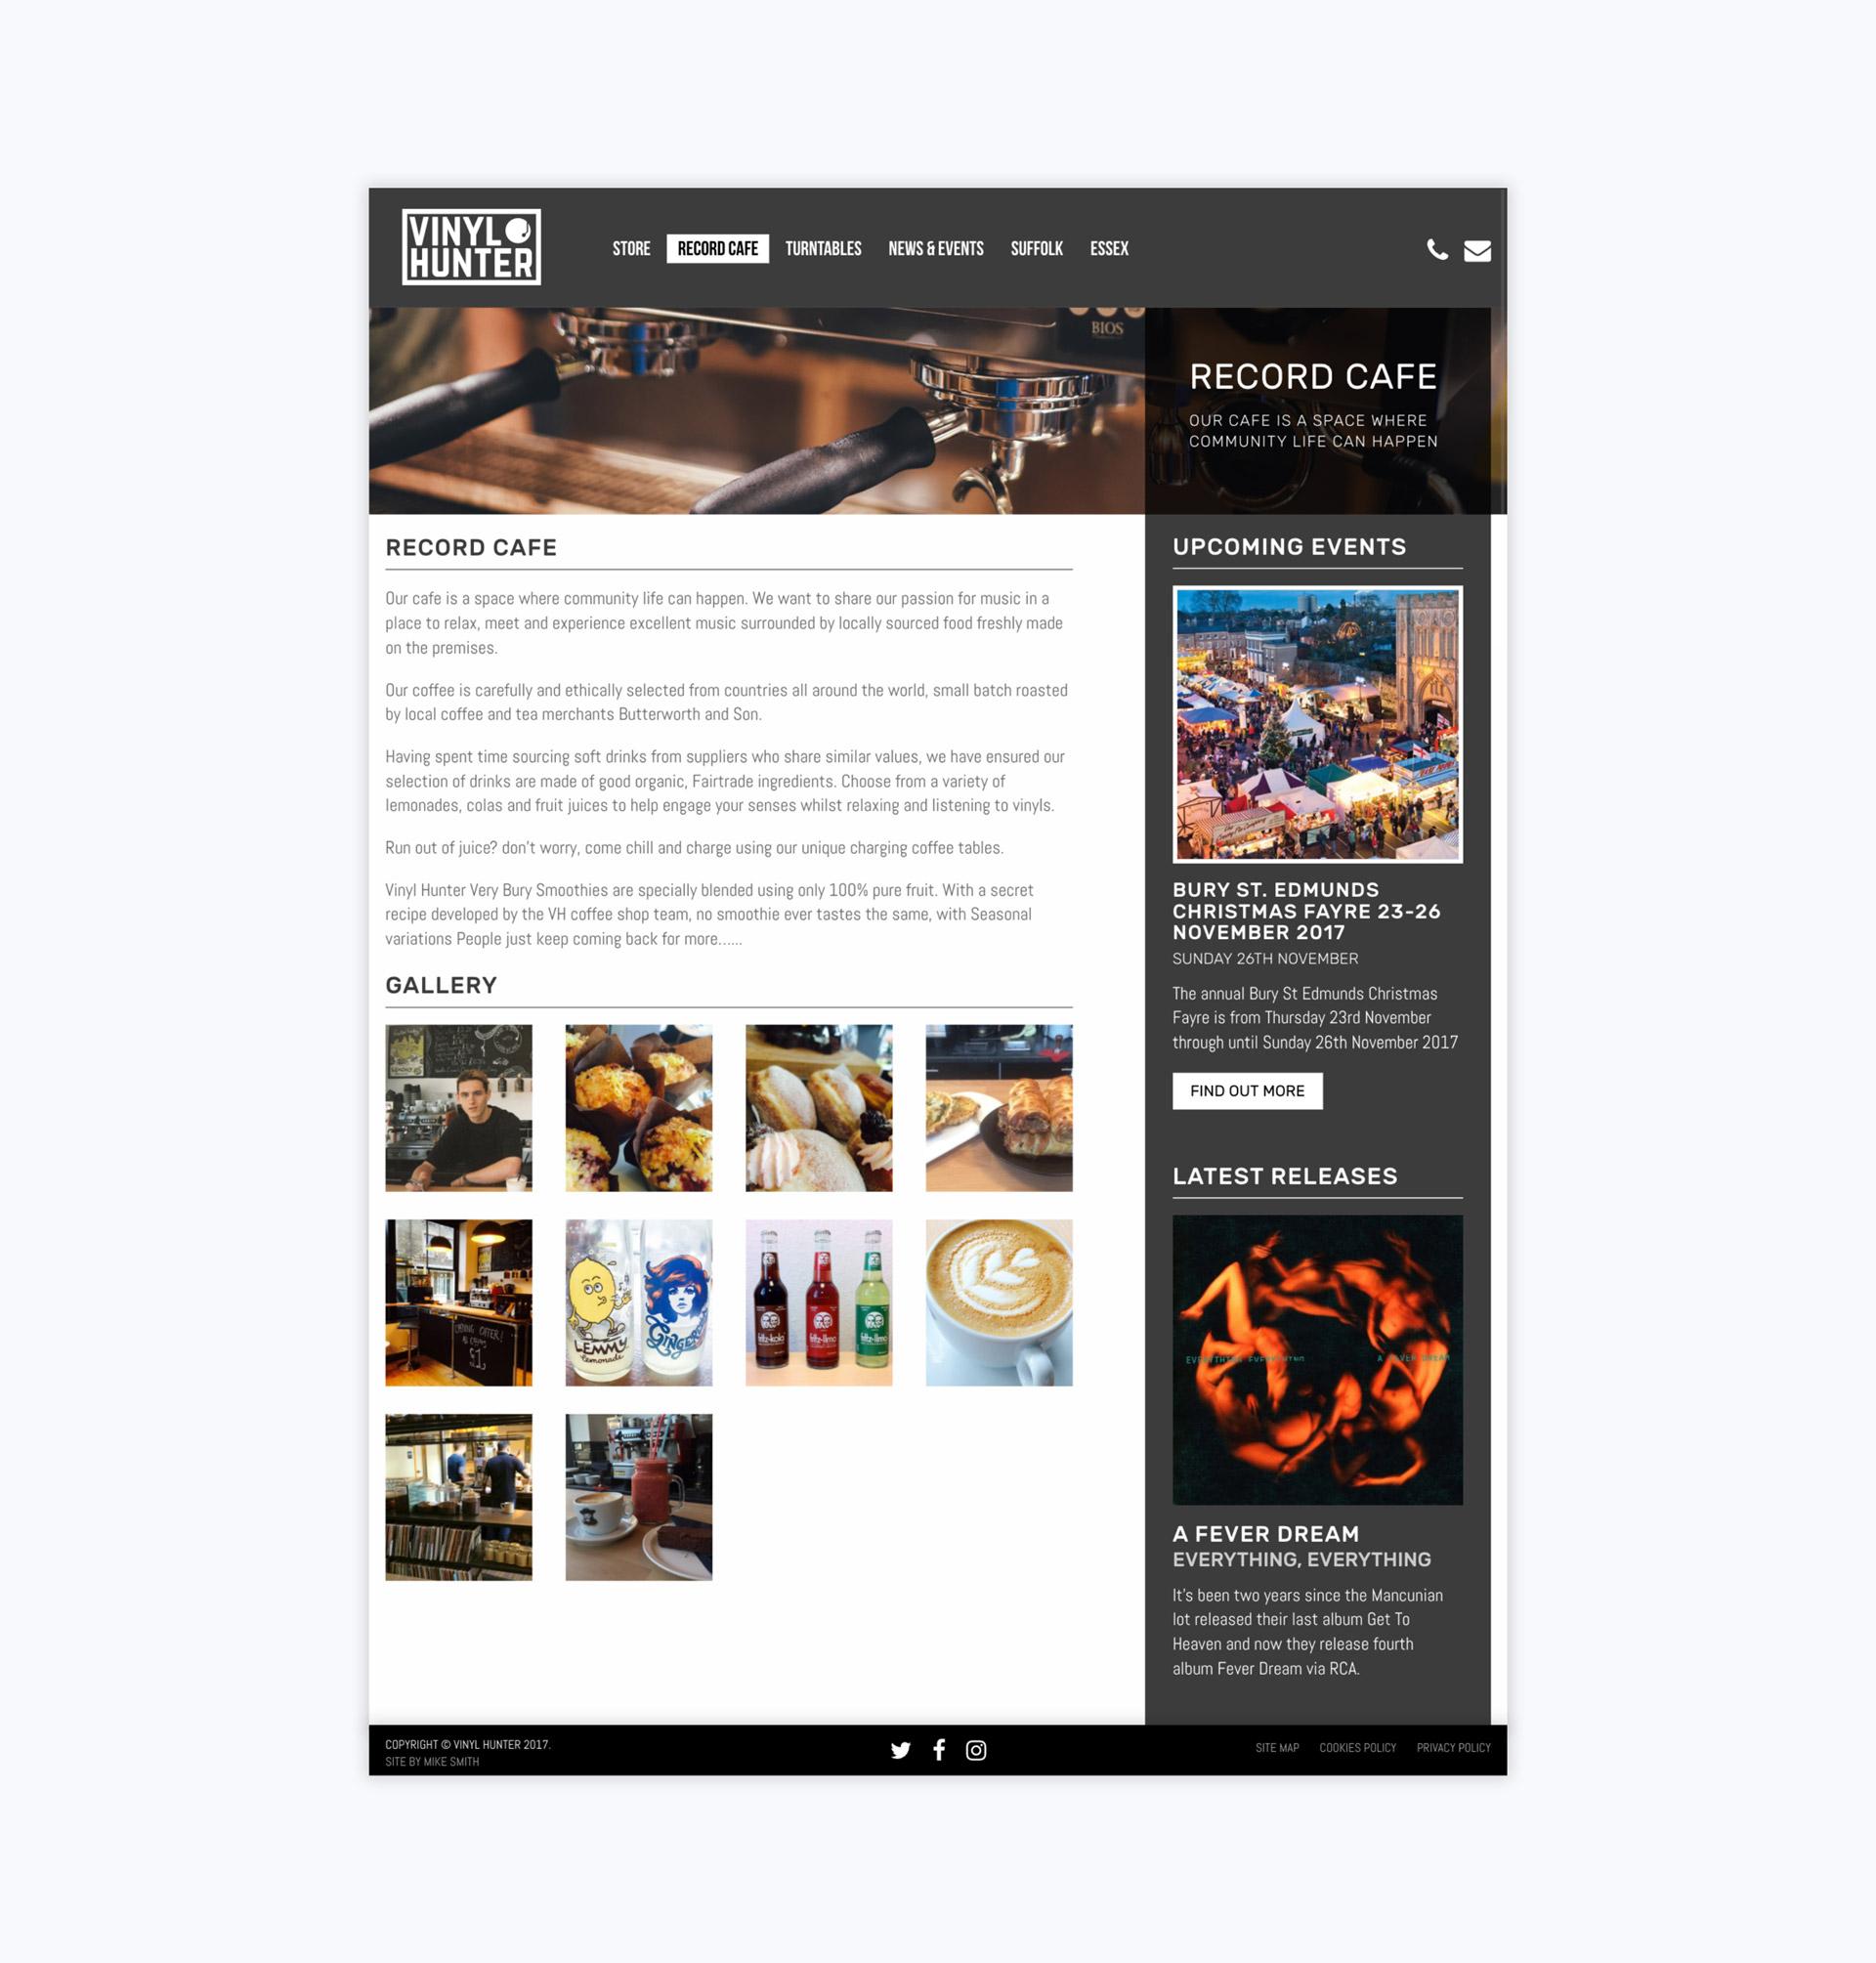 Vinyl Hunter Record Cafe Page Tablet